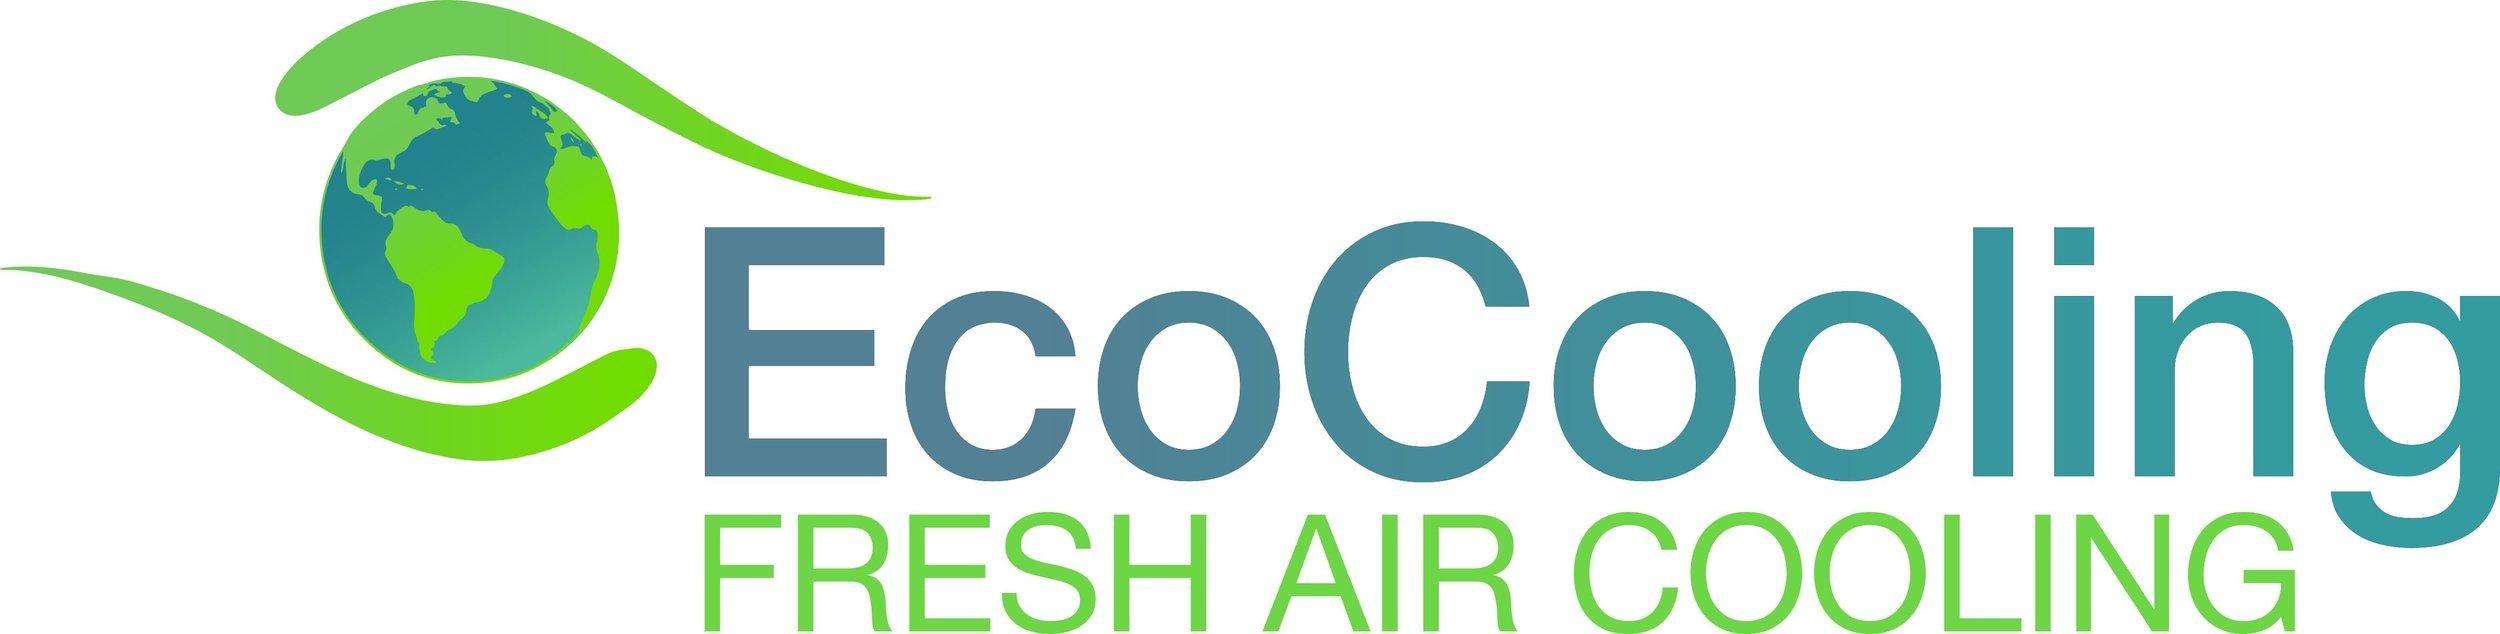 EcoCooling logo reg.jpg